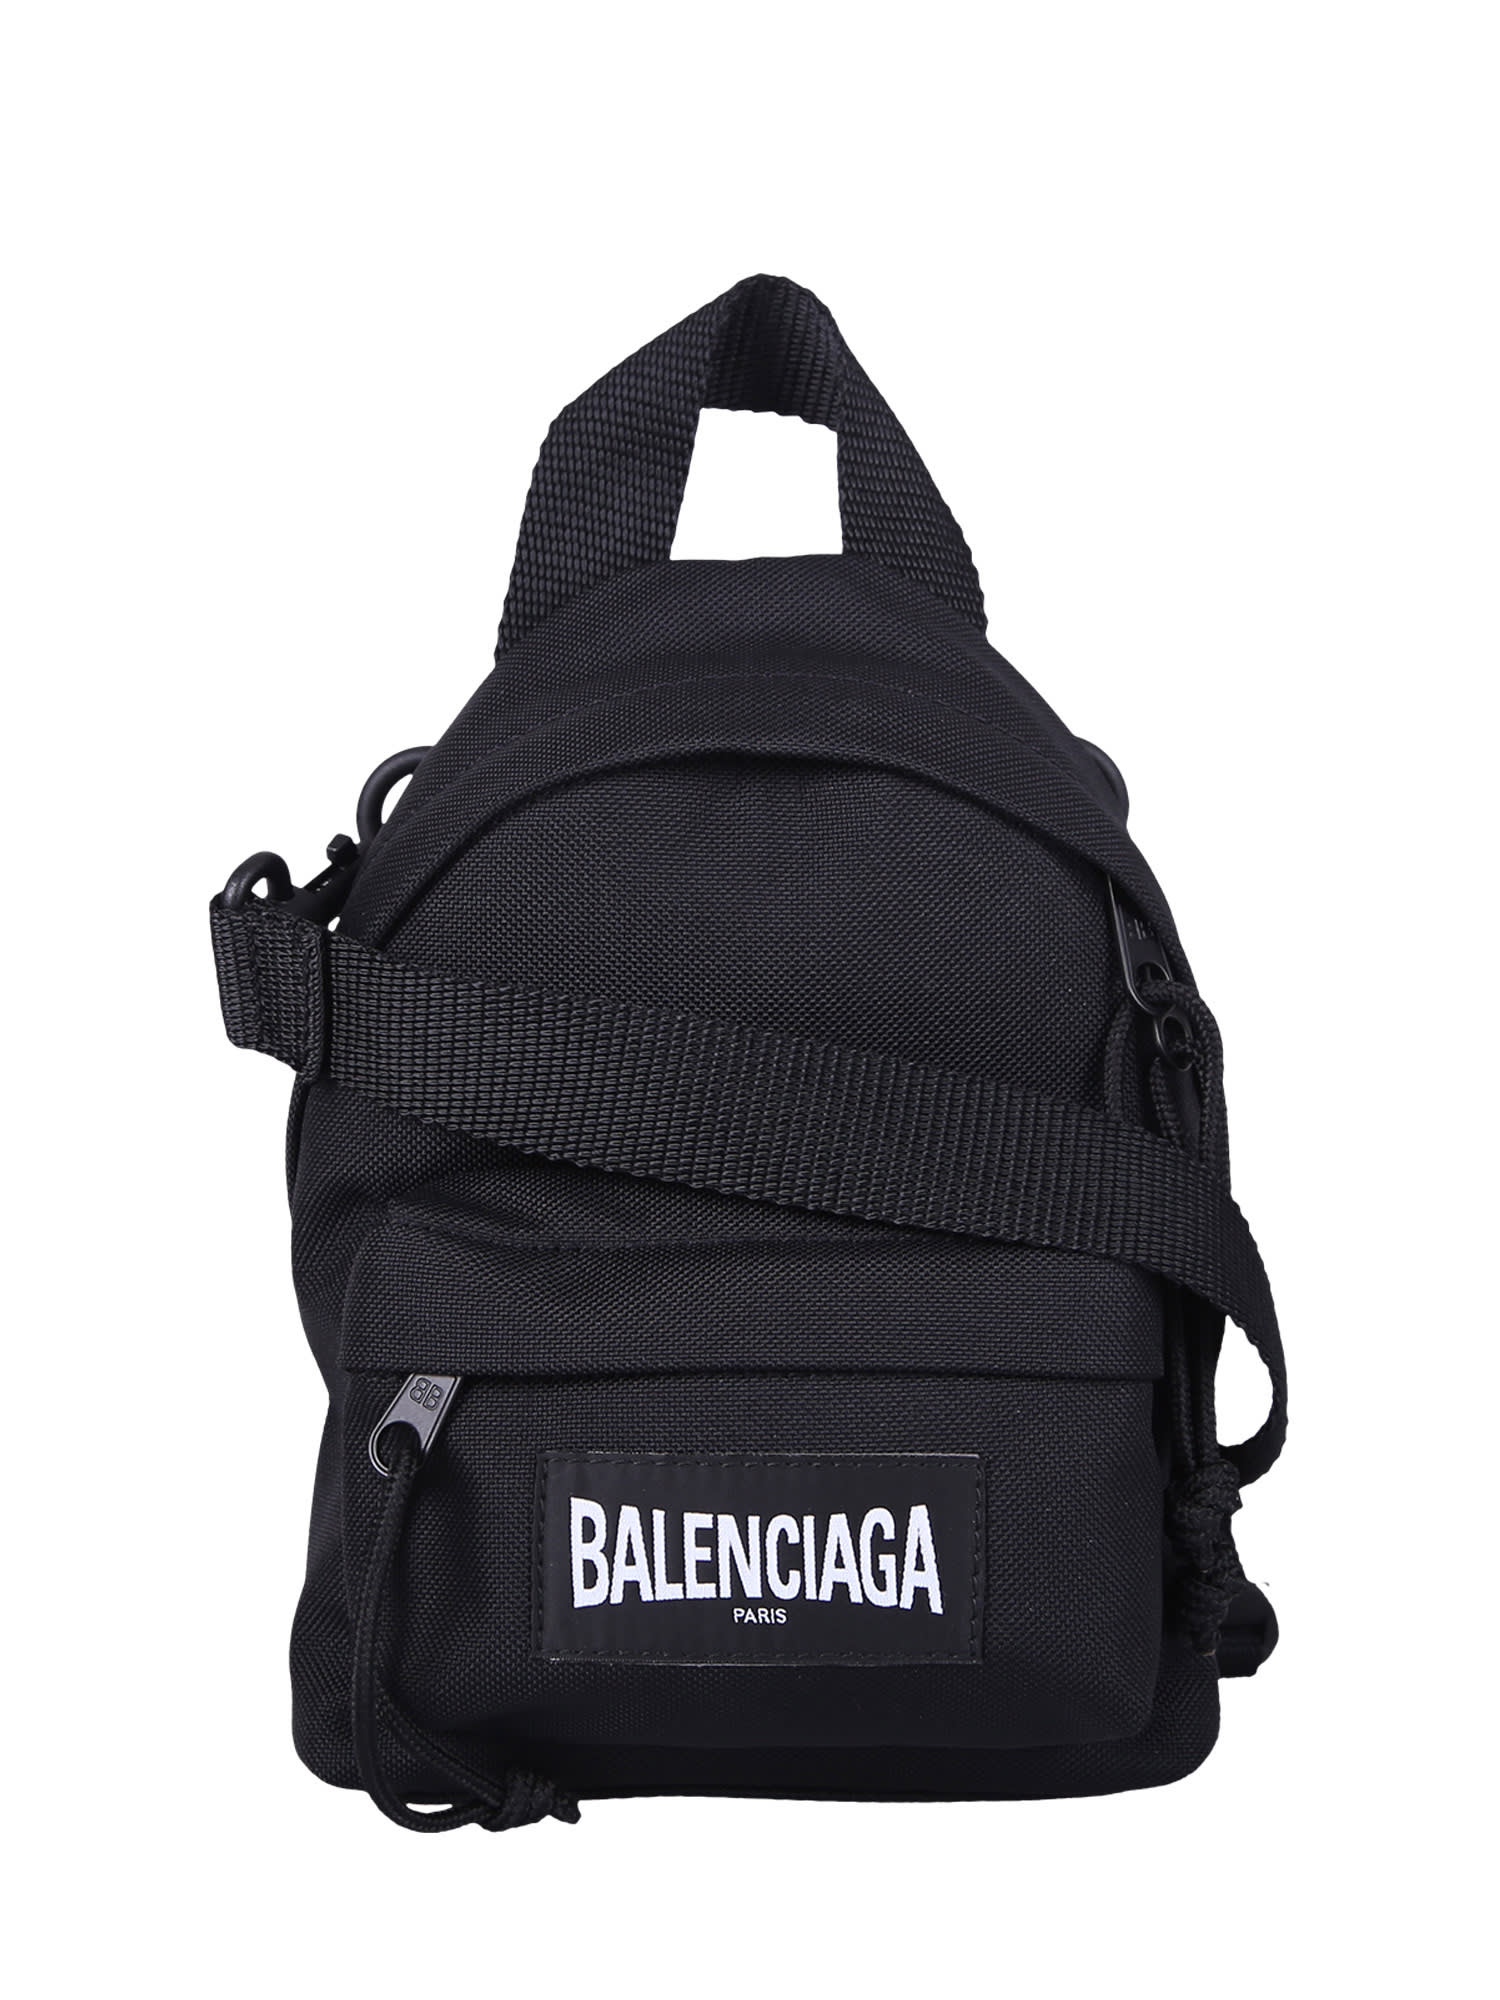 Balenciaga Branded Backpack